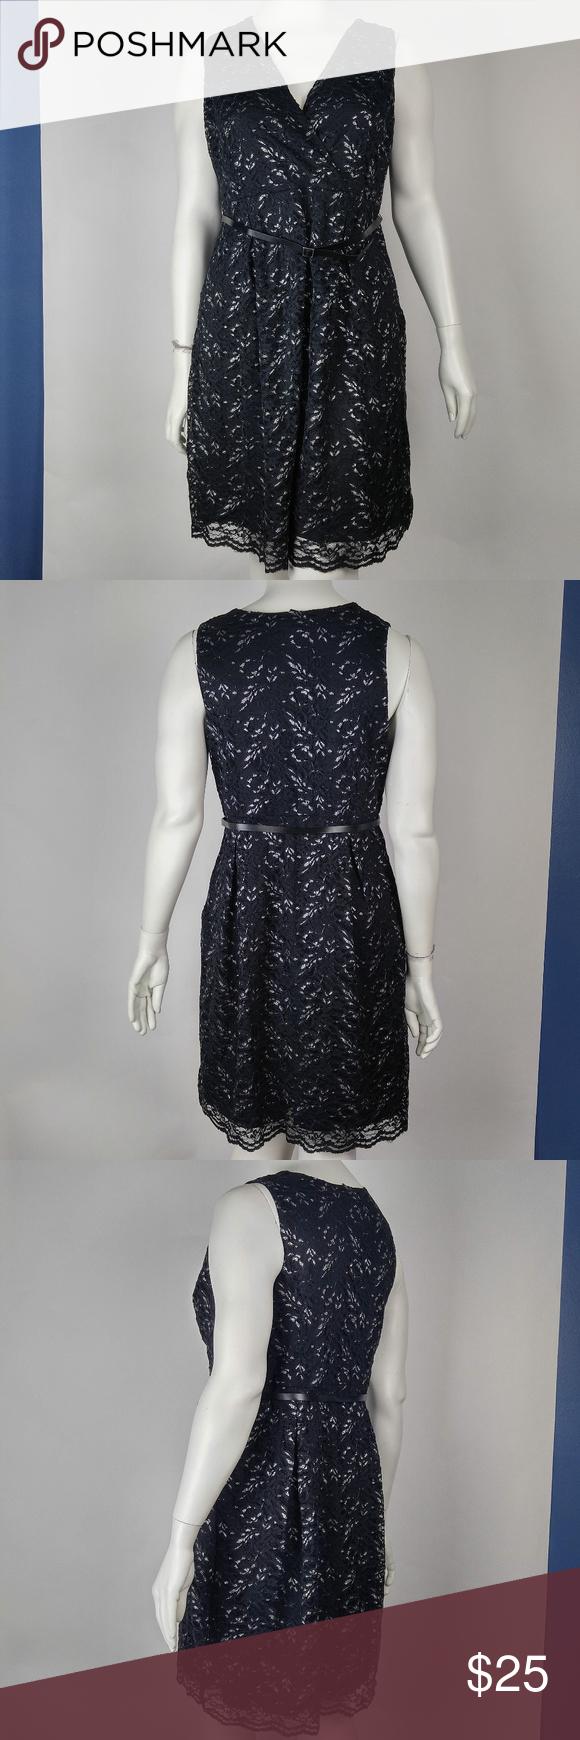 b276961197f Lane Bryant Dress Lace Overlay Black Lane Bryant Women s Dress Lace Overlay  Black Silver Metallic Plus Size 16 Lace Overlay Belted Silver Metallic ...